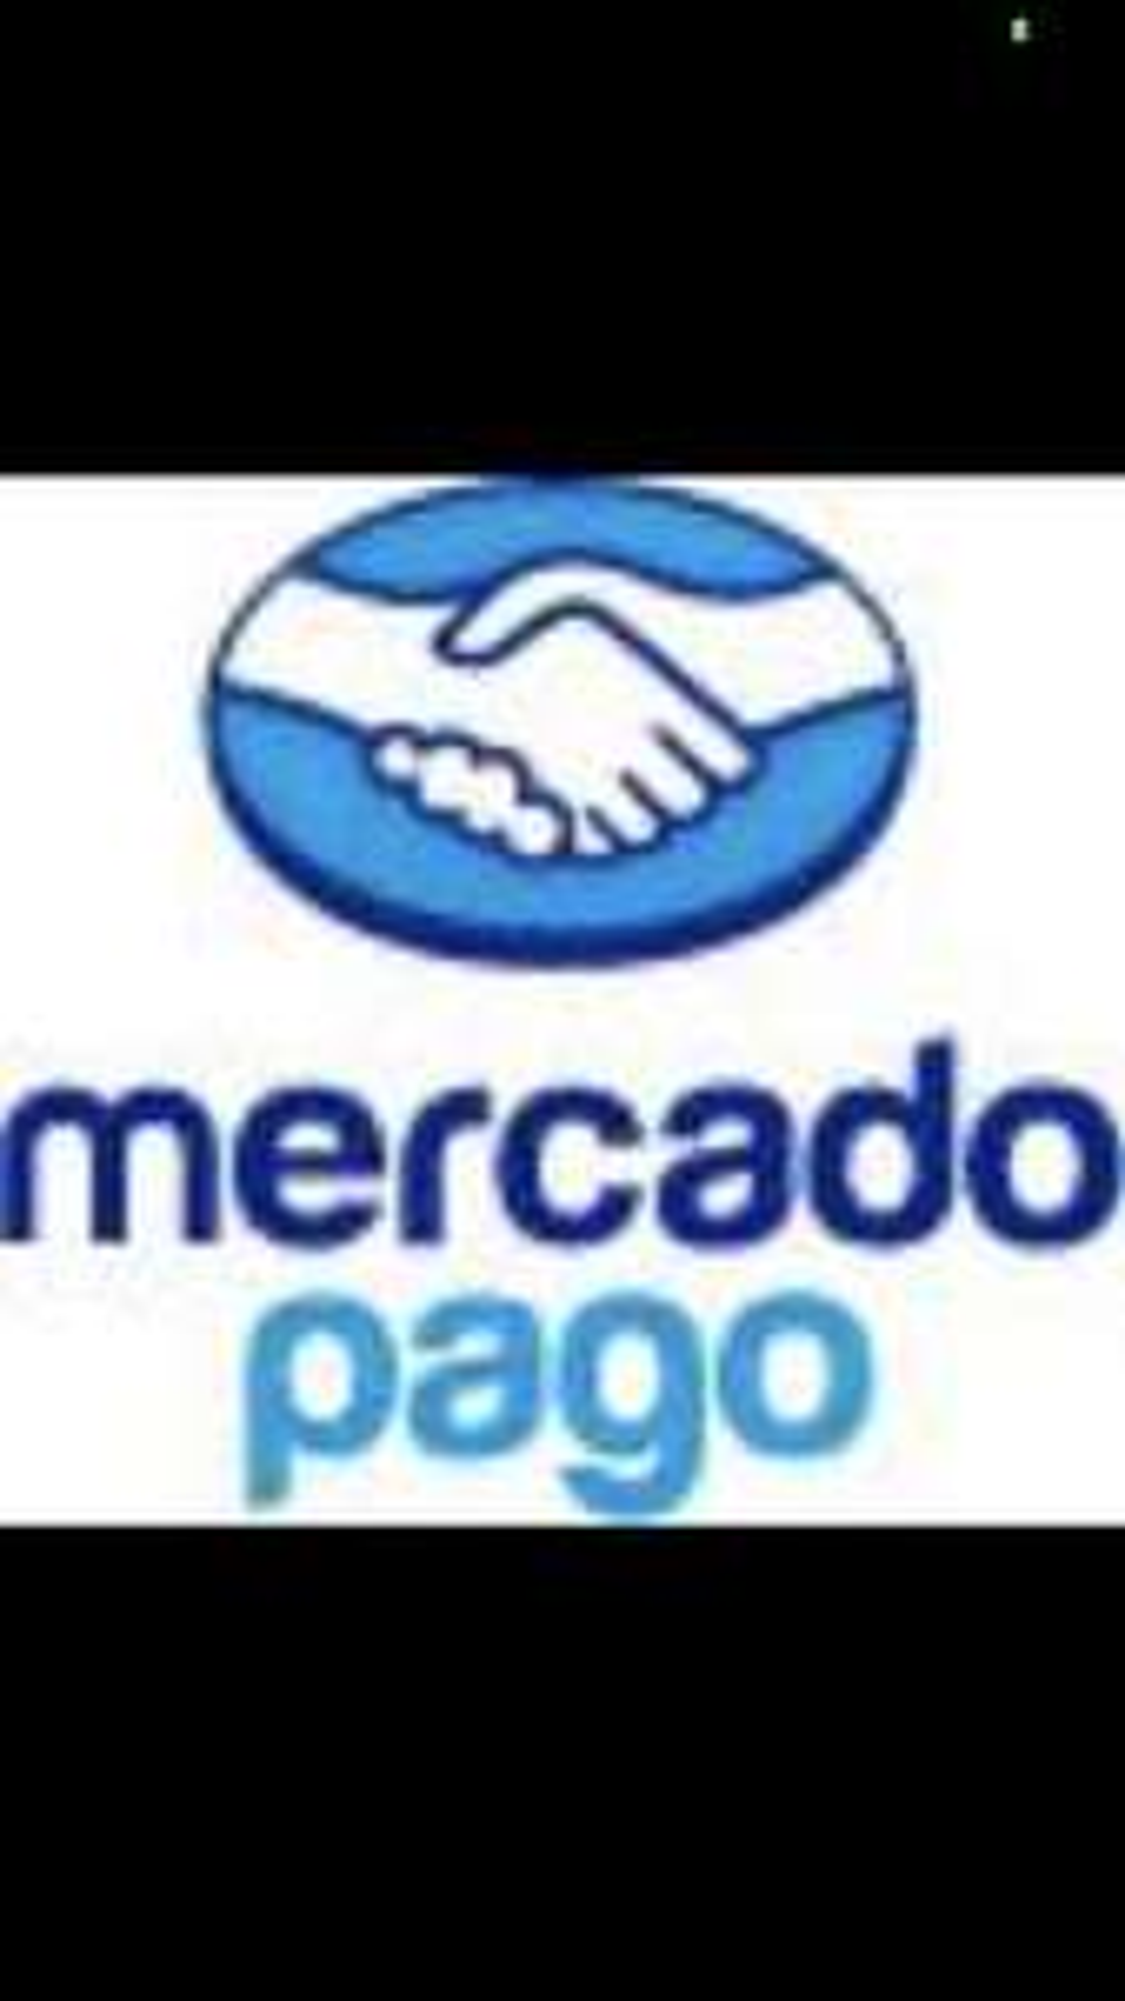 Mercado pago 50% en recargas telefónicas de 100 pesos